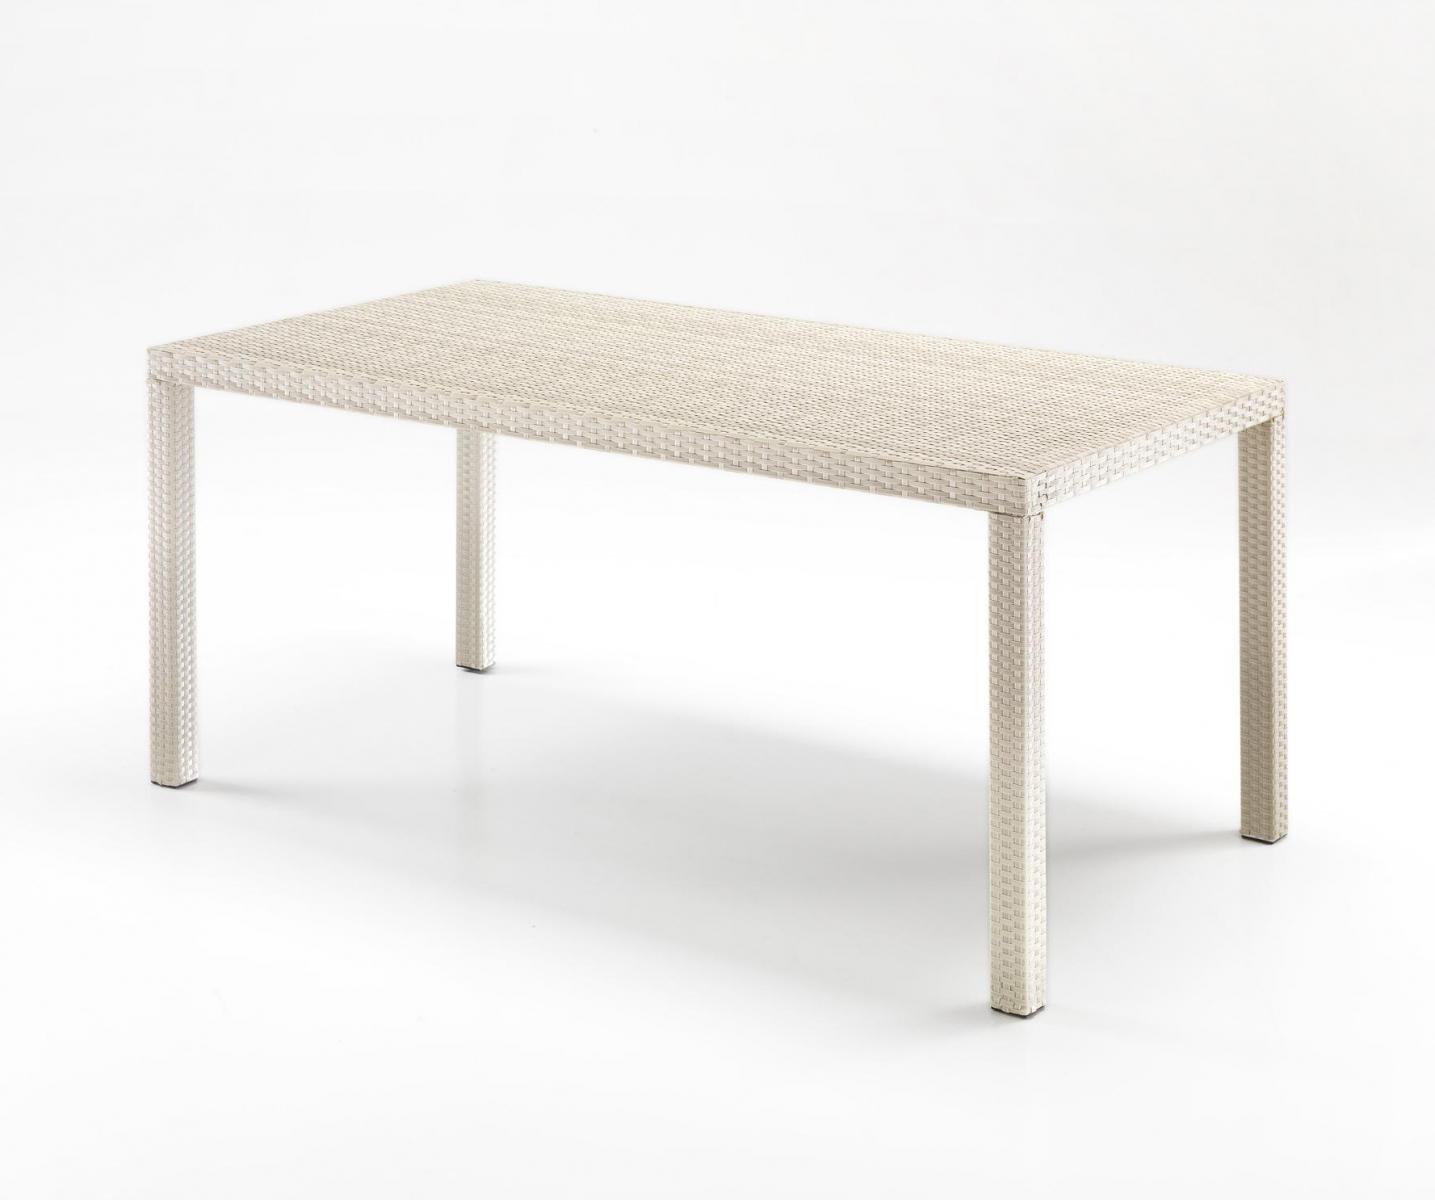 Стол плетеный со стеклом Contract